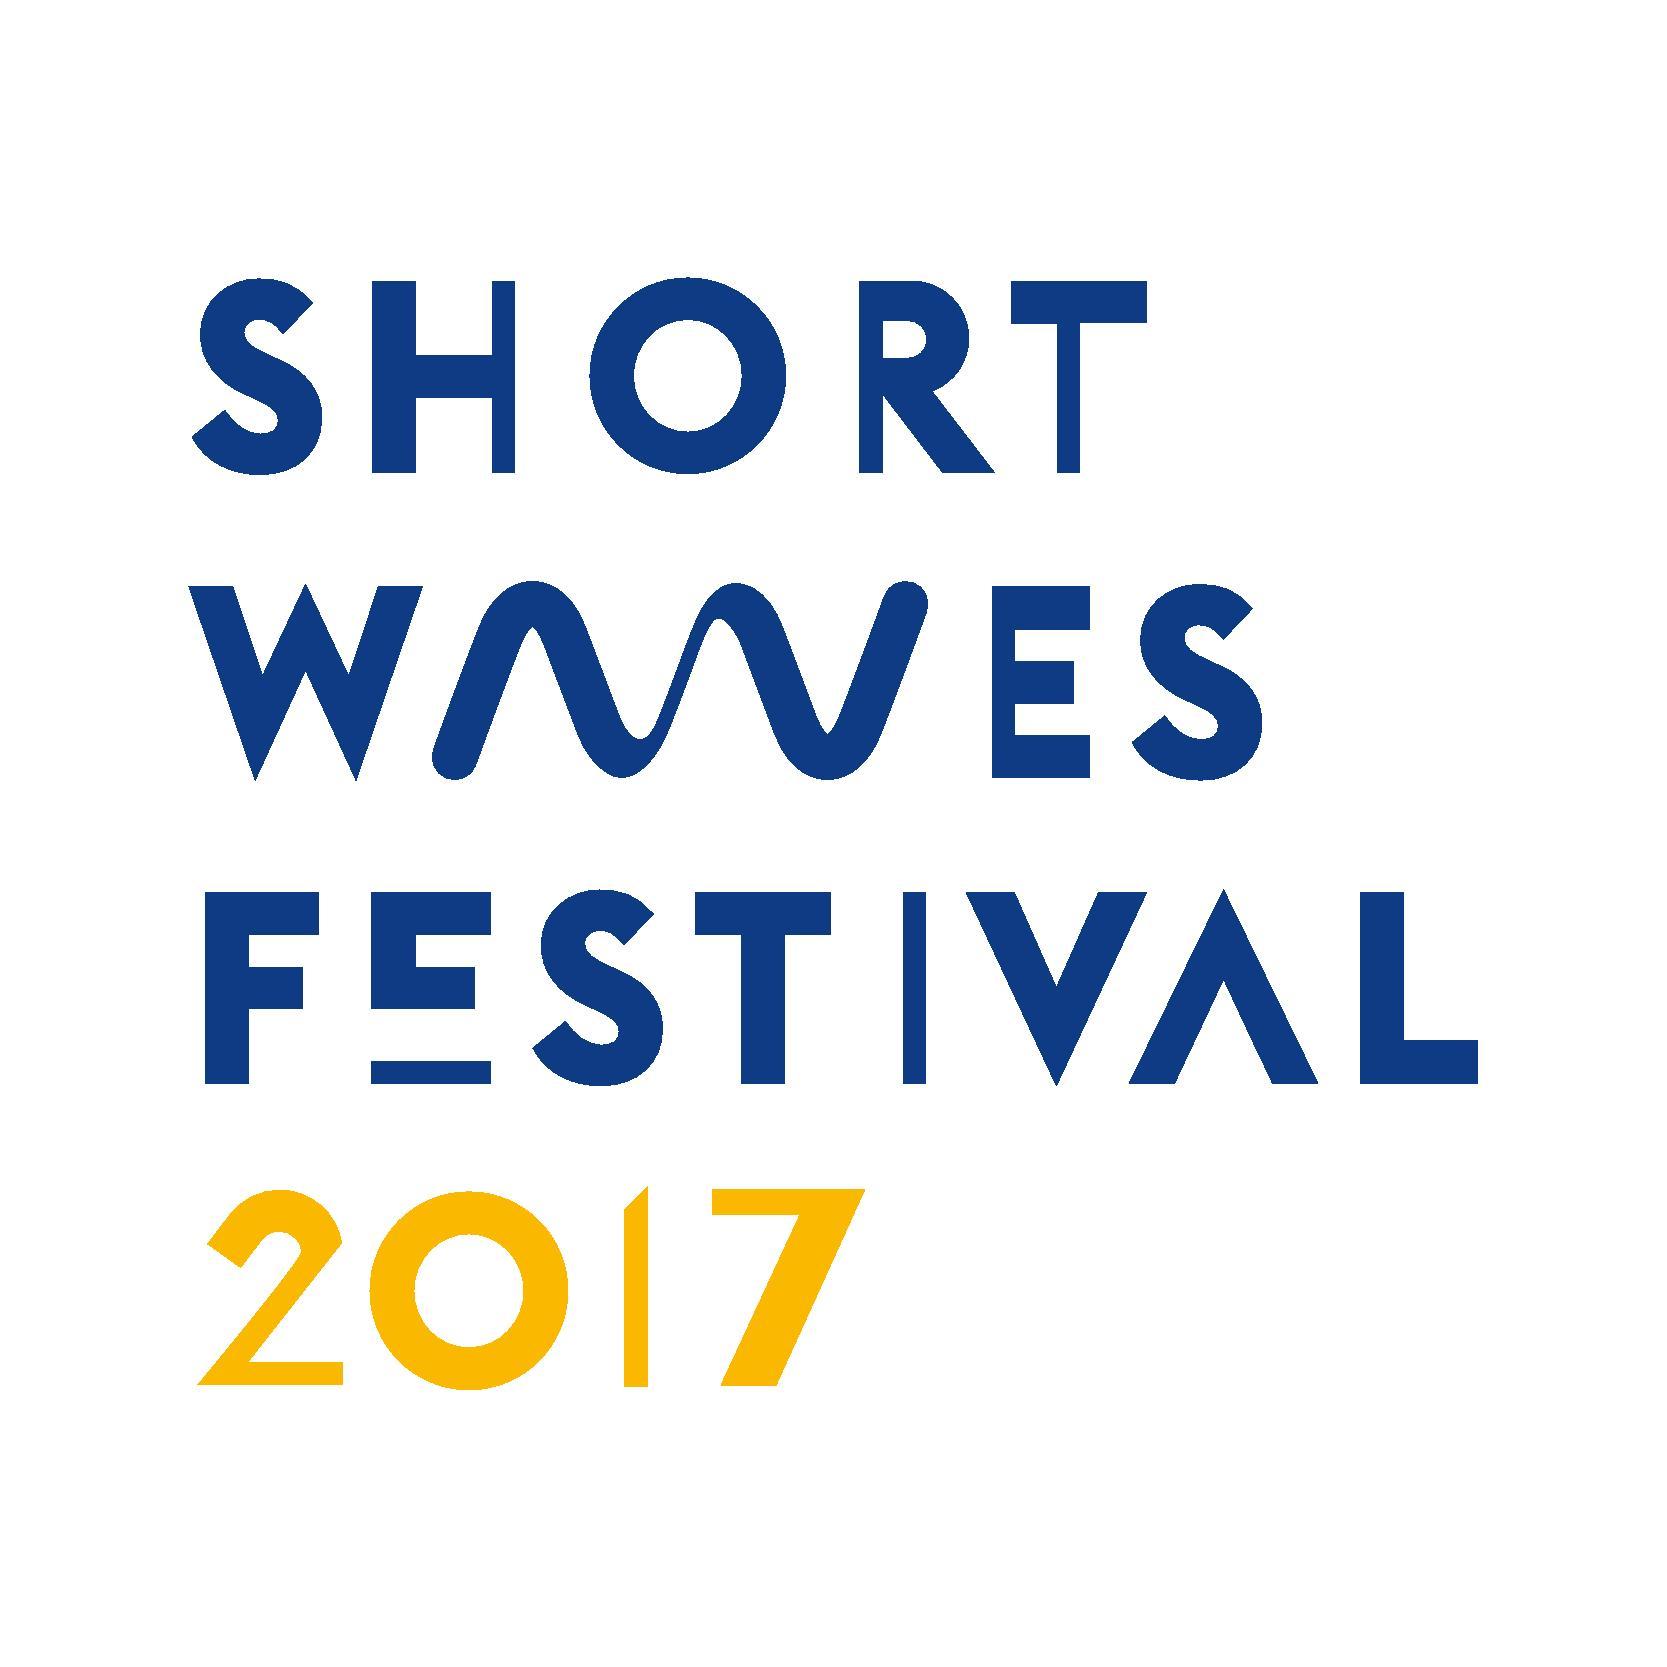 1667x1667 Short Waves Festival 2017